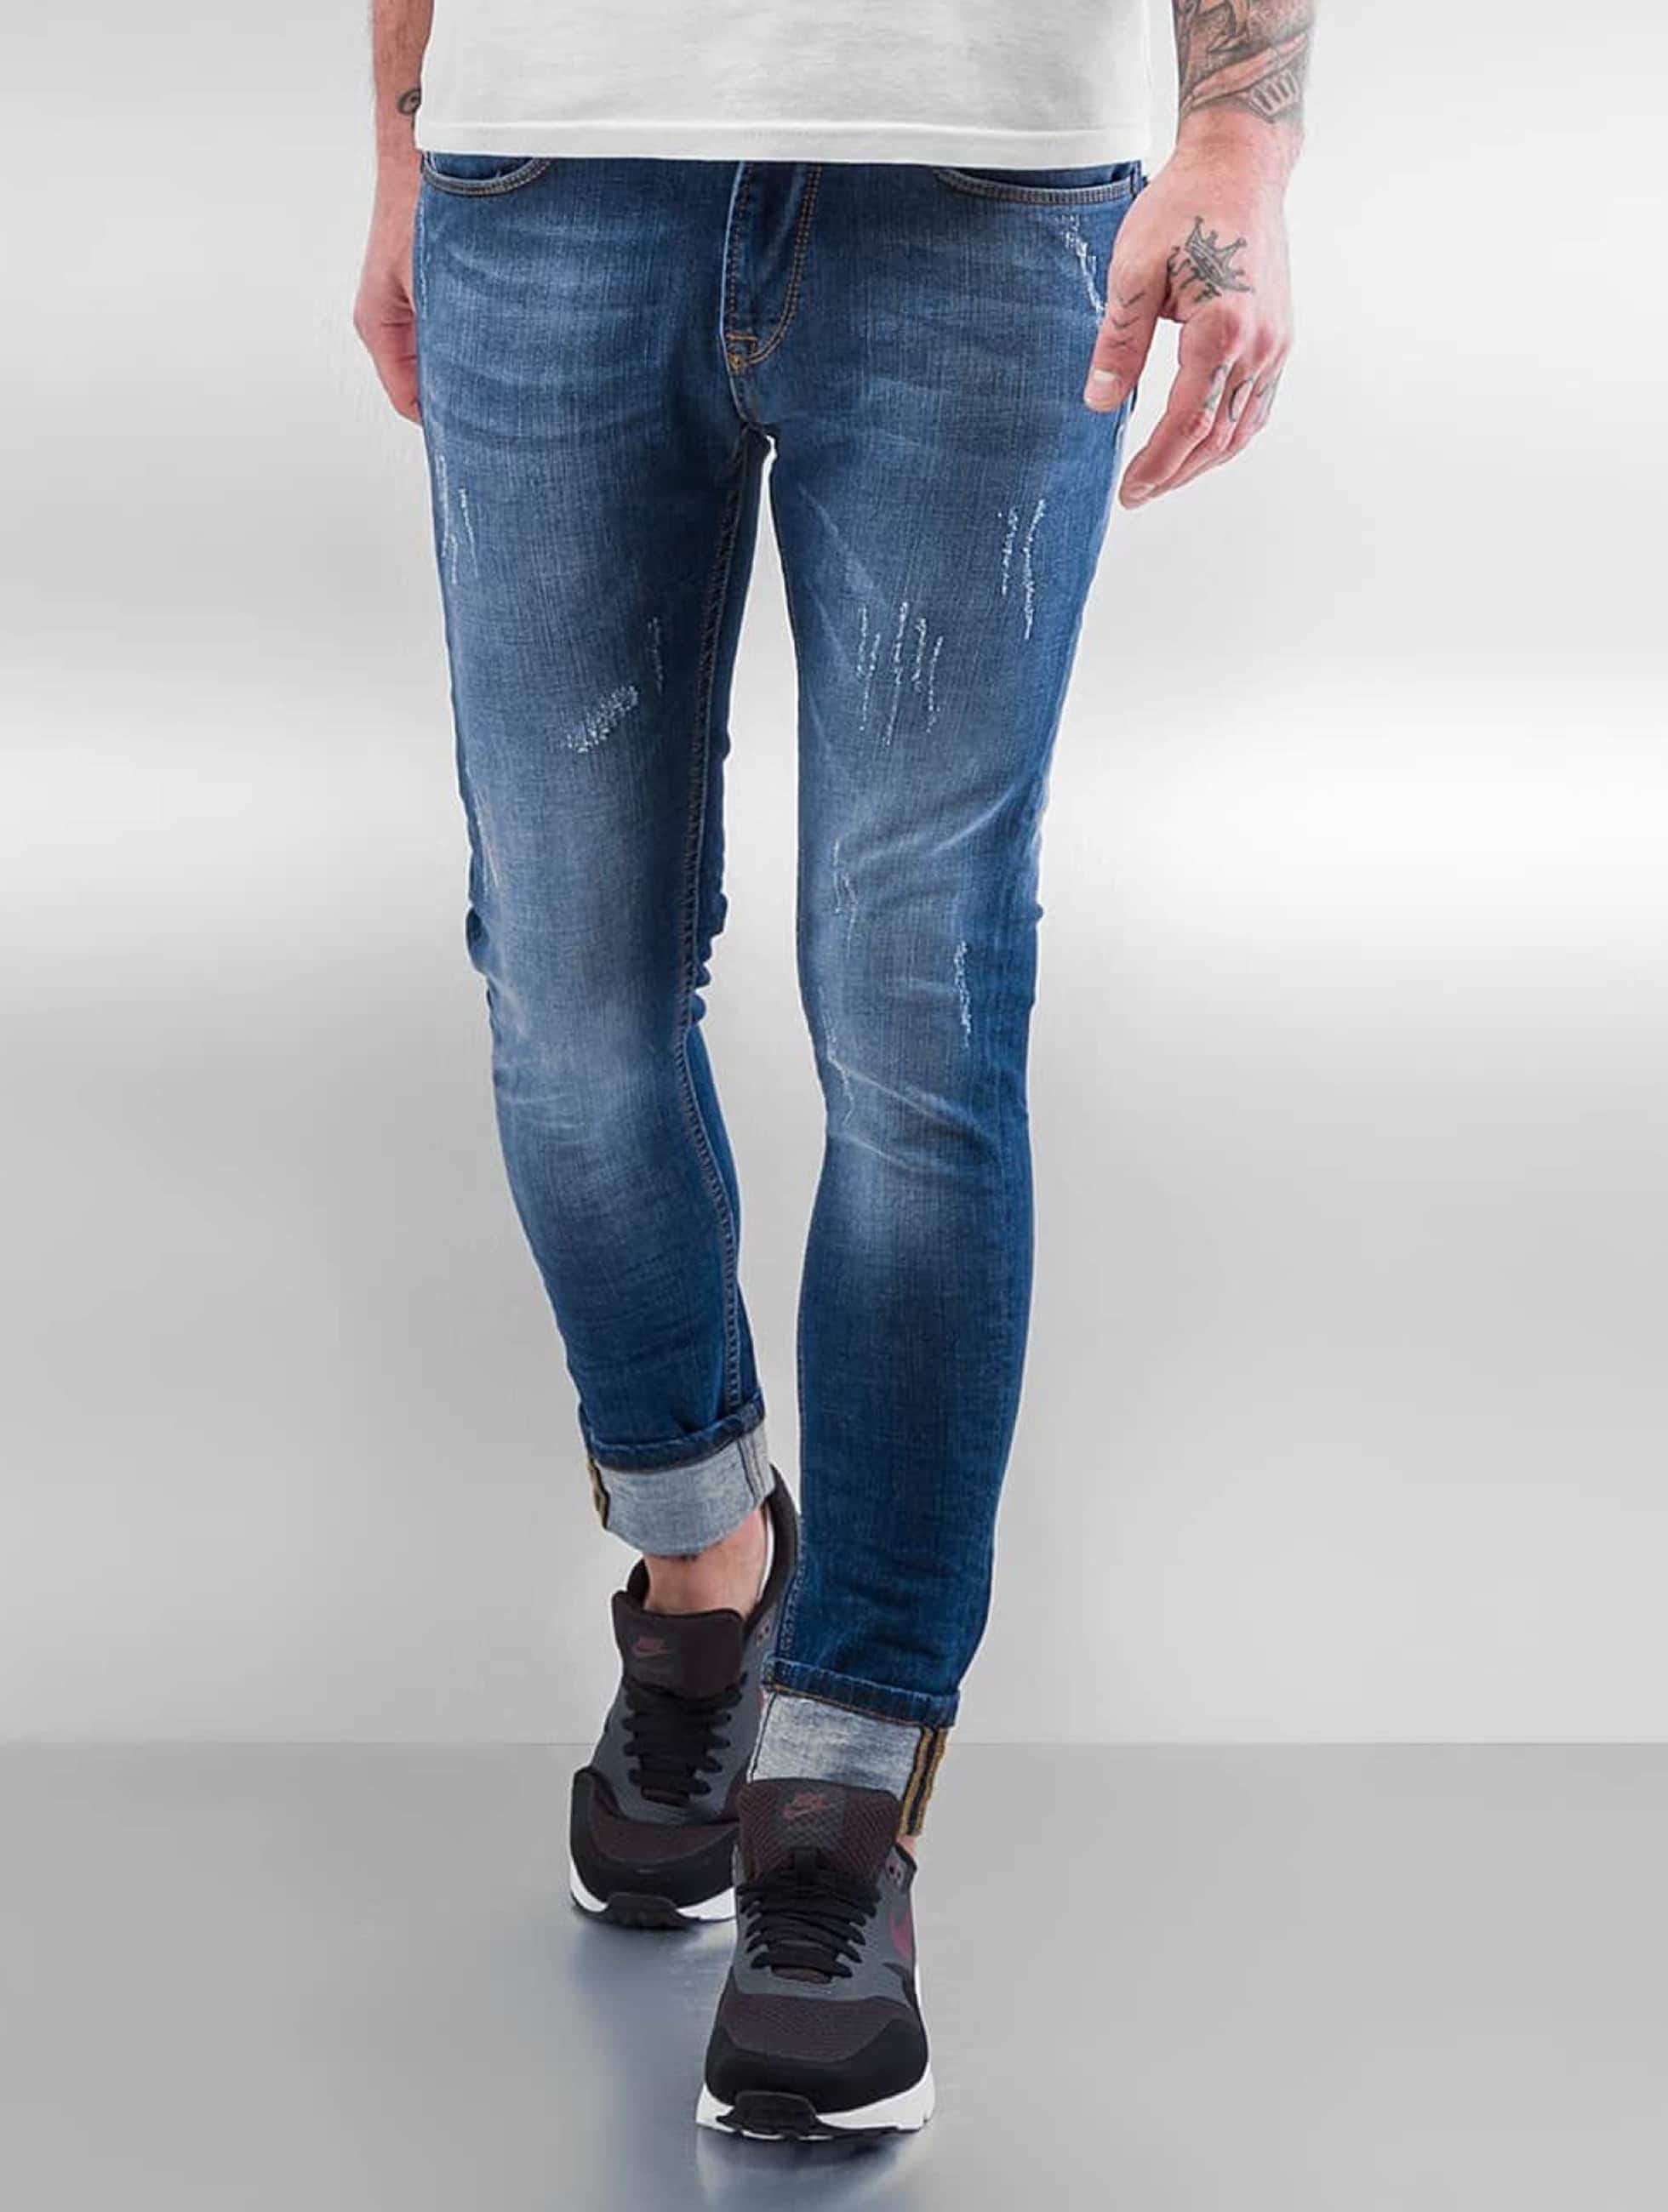 2Y / Skinny Jeans Ypern in blue W 31